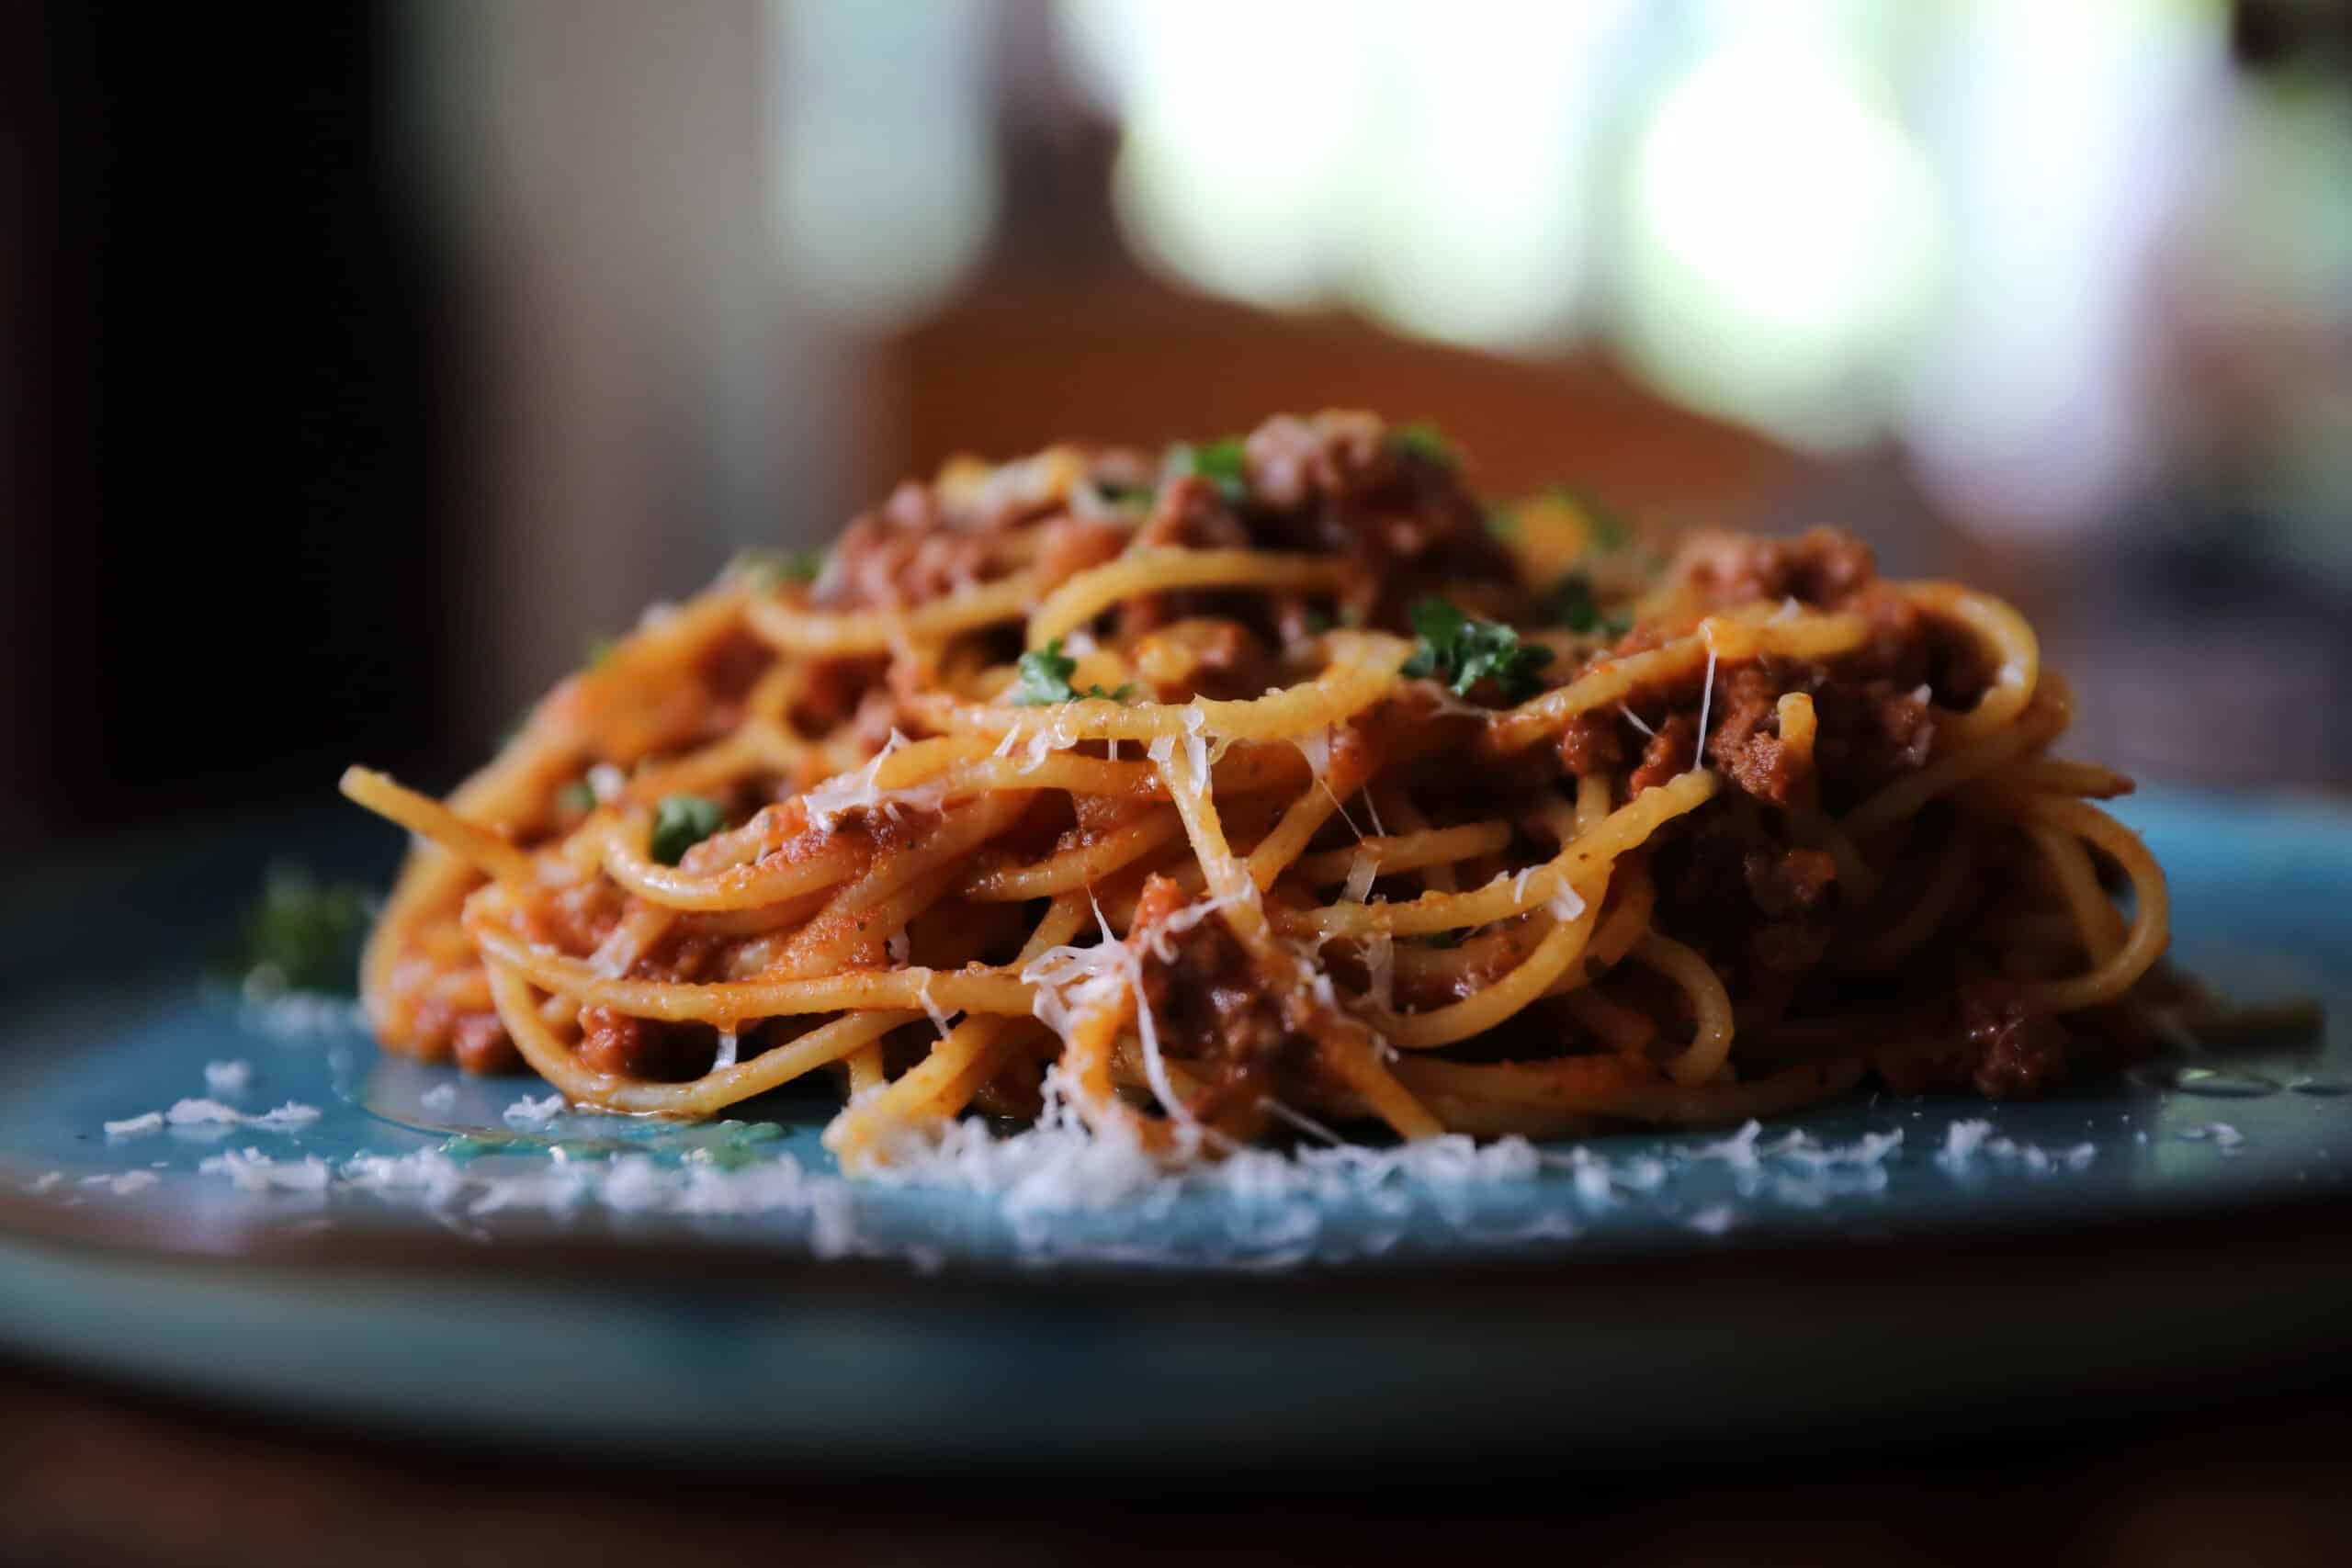 Spaghetti Bolognese – Recipes to Treat Mum